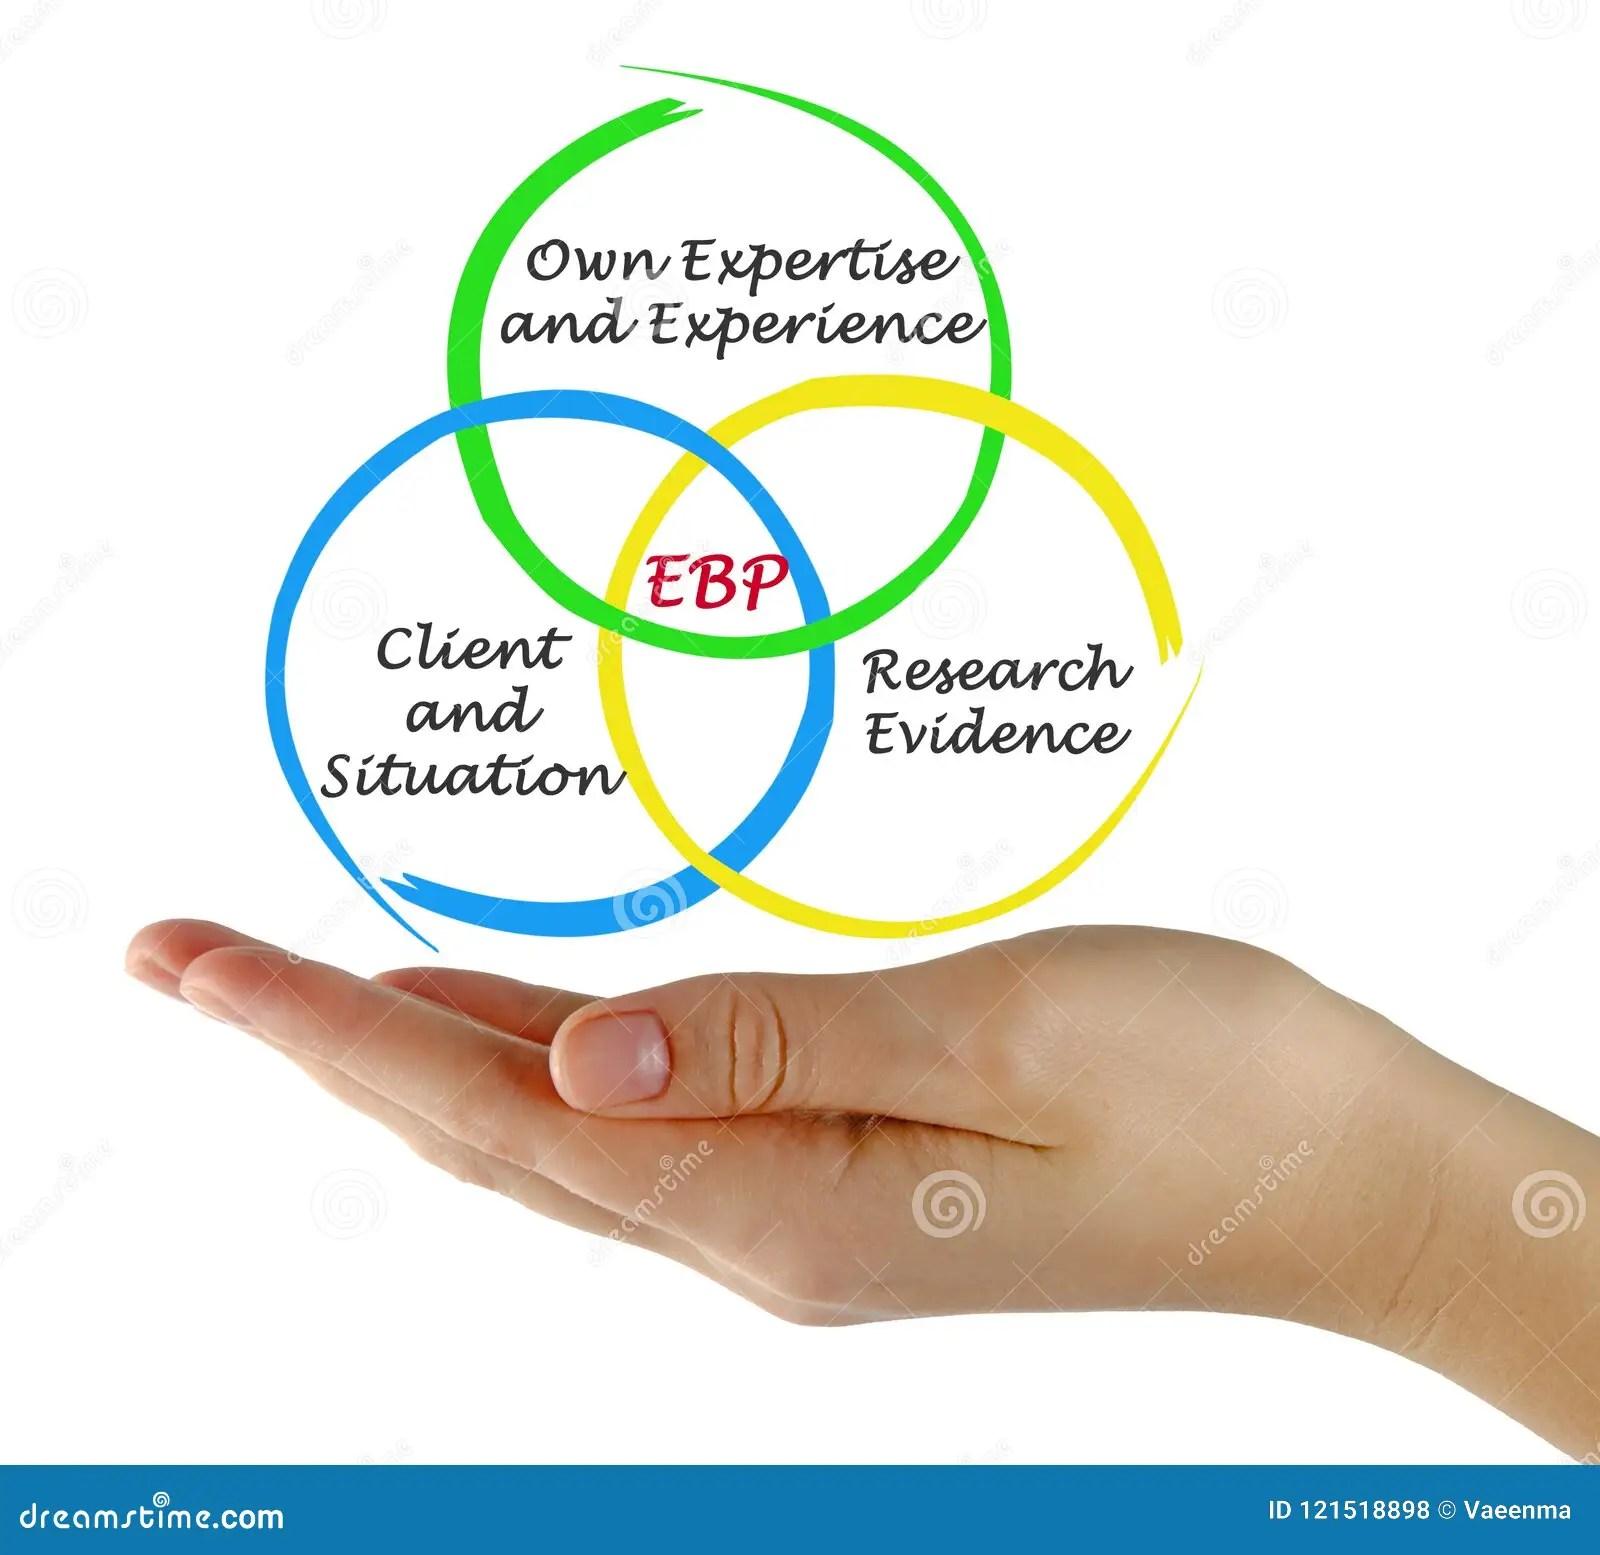 Evidence Based Practice Ebp Stock Photo